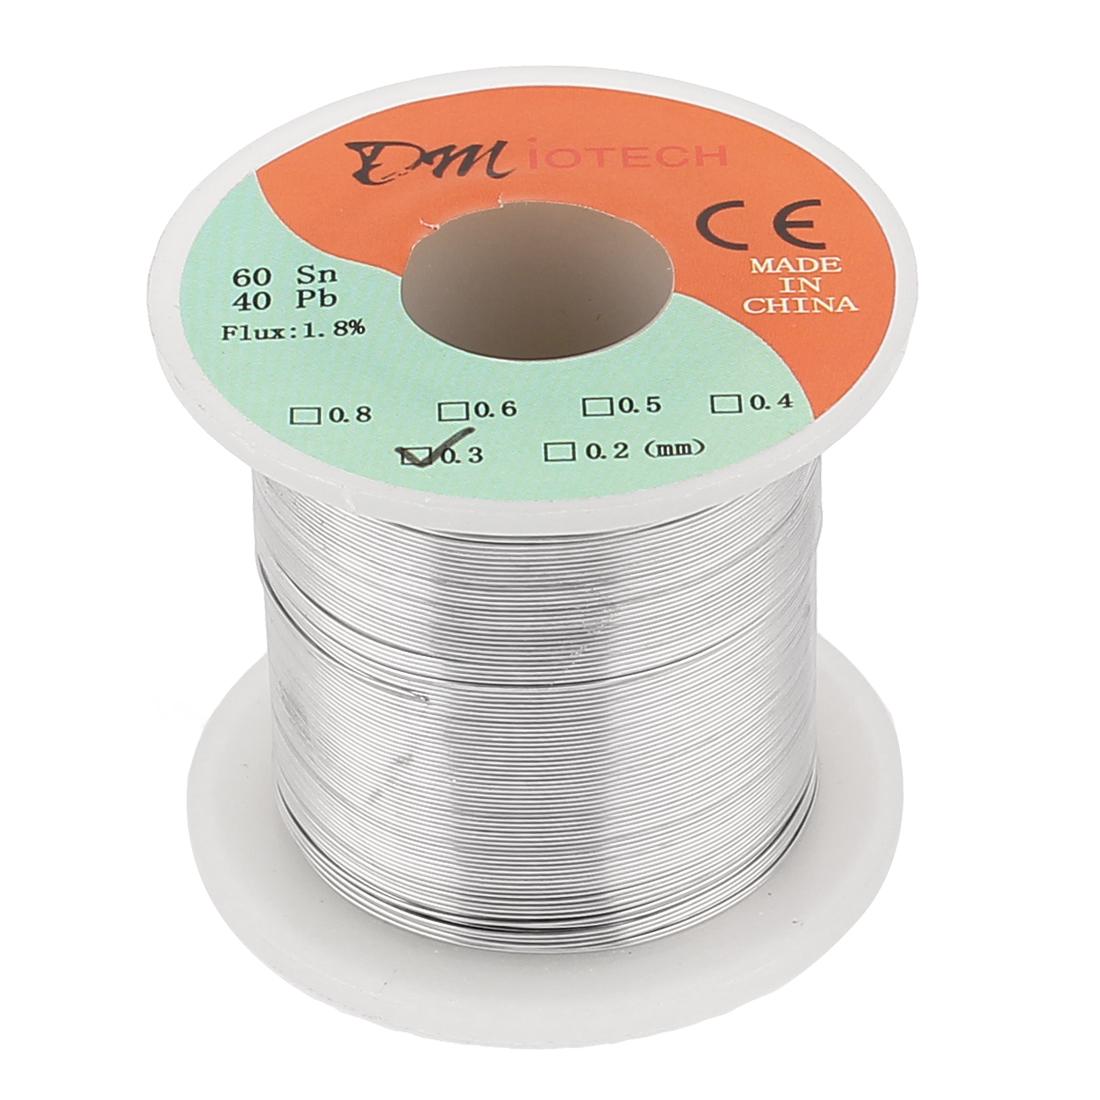 0.3mm 200G 60/40 Rosin Core Tin Lead Roll Soldering Solder Wire